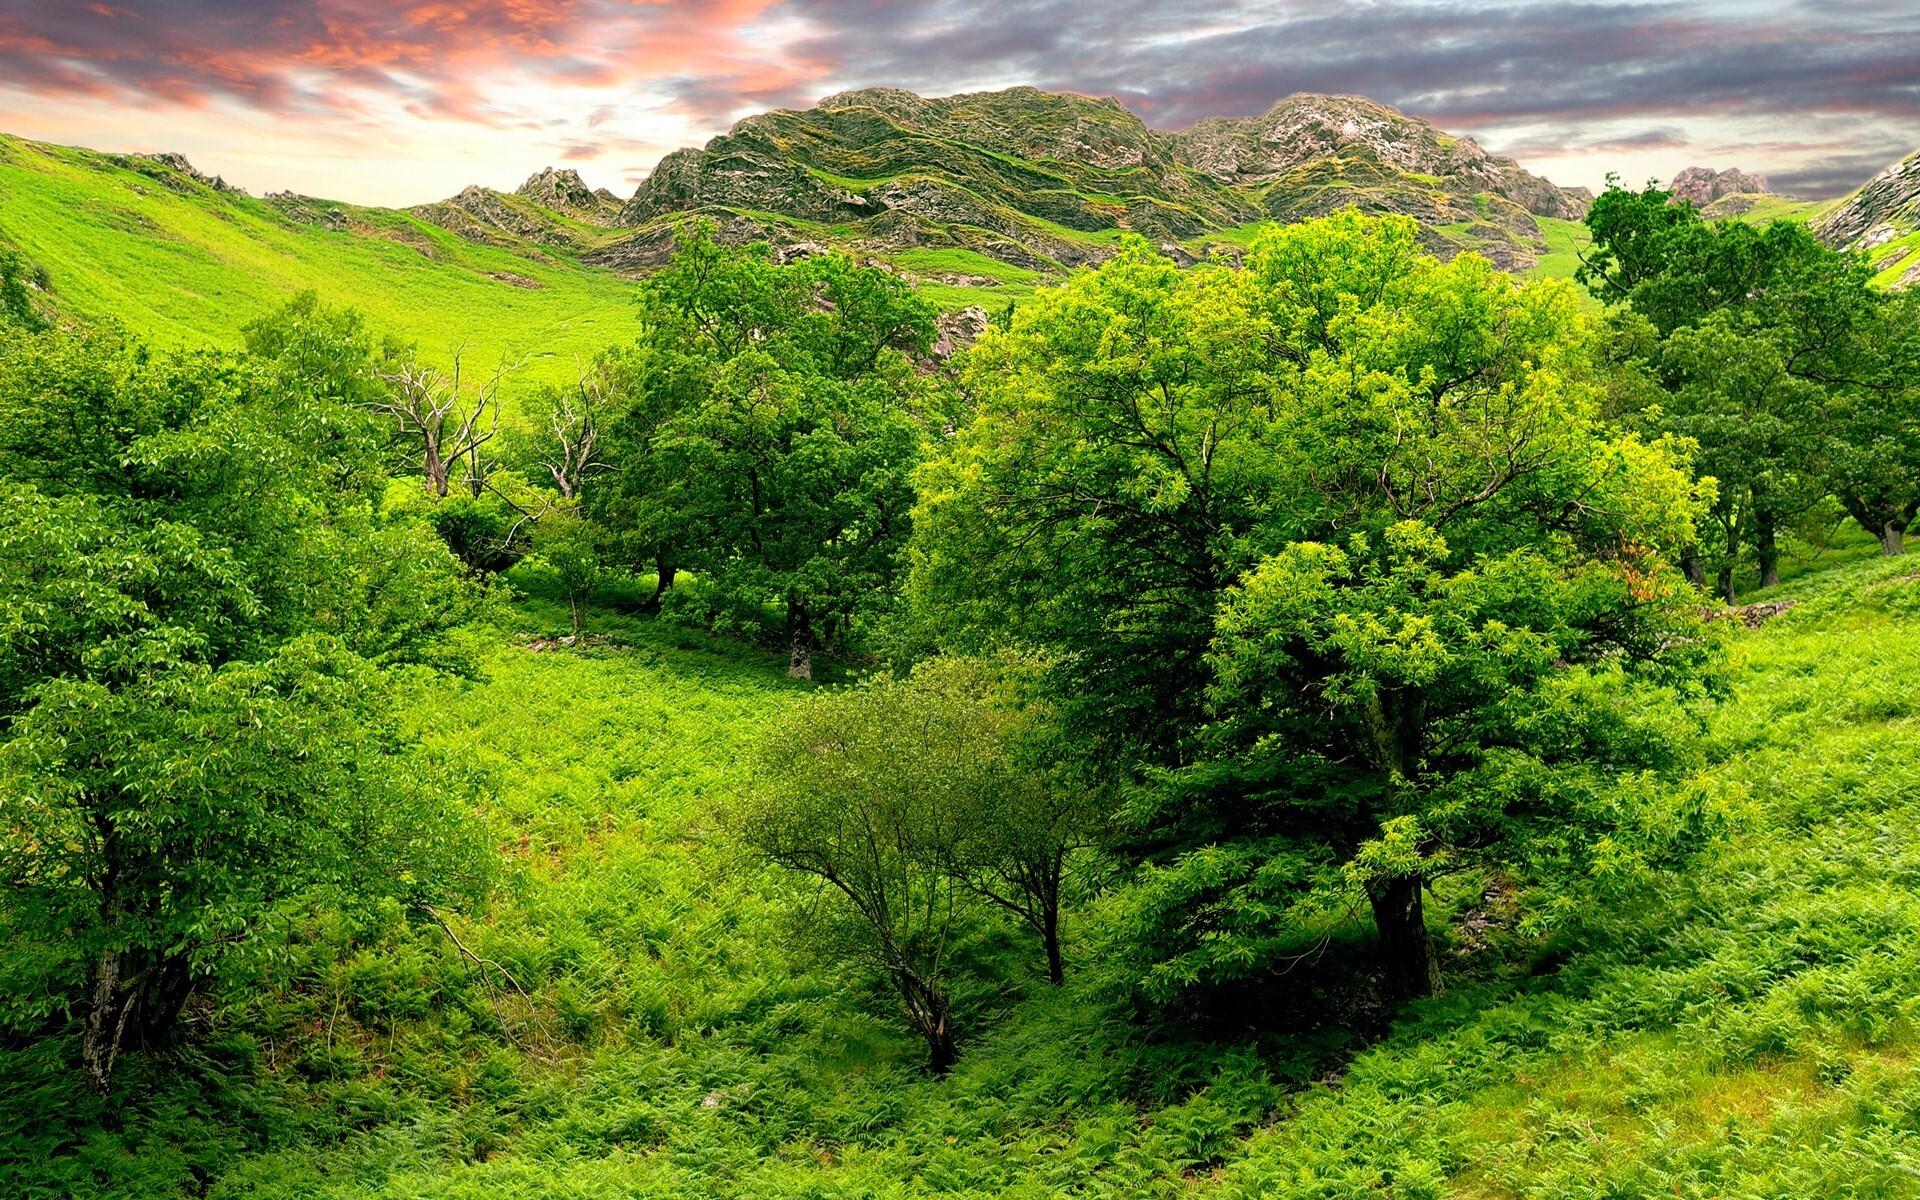 Beautiful Green Nature Pic Hd Wallpapers